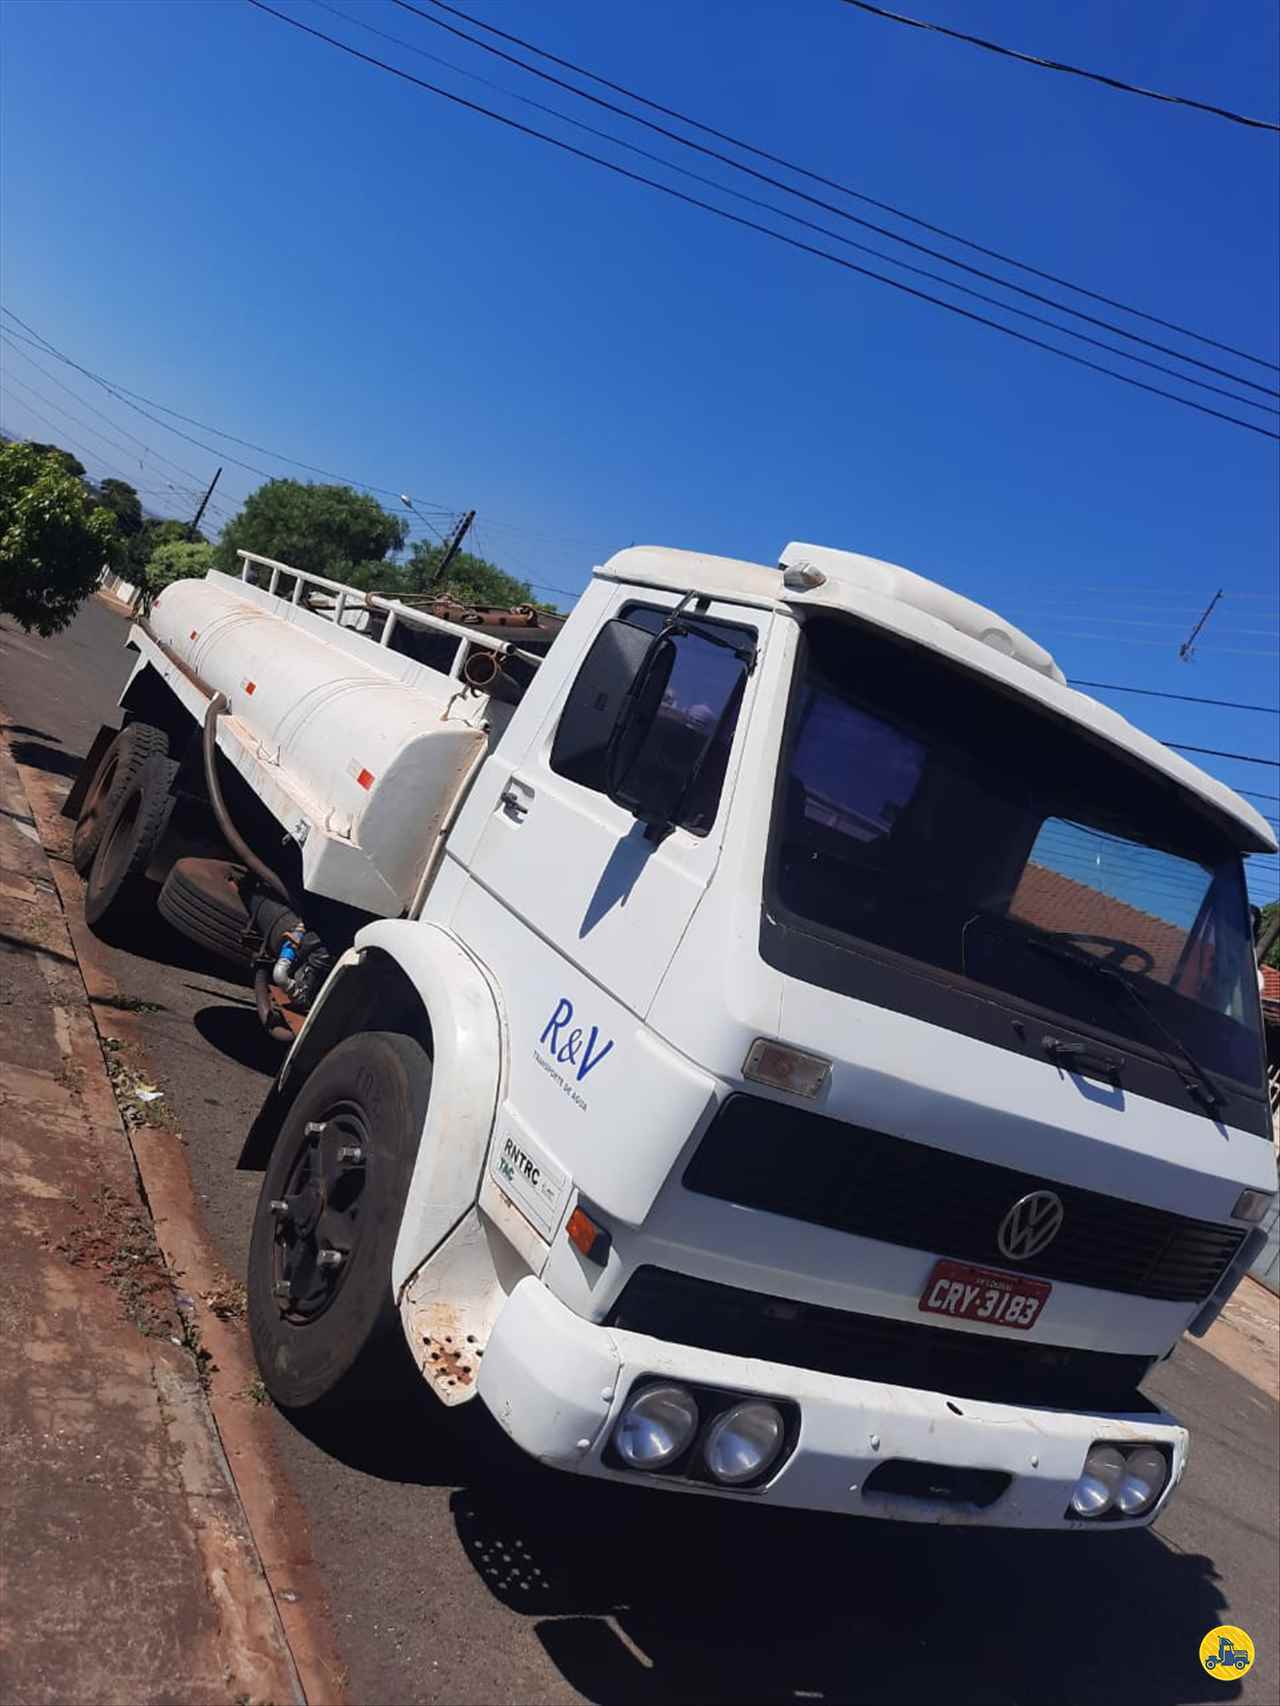 CAMINHAO VOLKSWAGEN VW 14140 Chassis Truck 6x2 Maracavel Londrina Caminhões LONDRINA PARANÁ PR